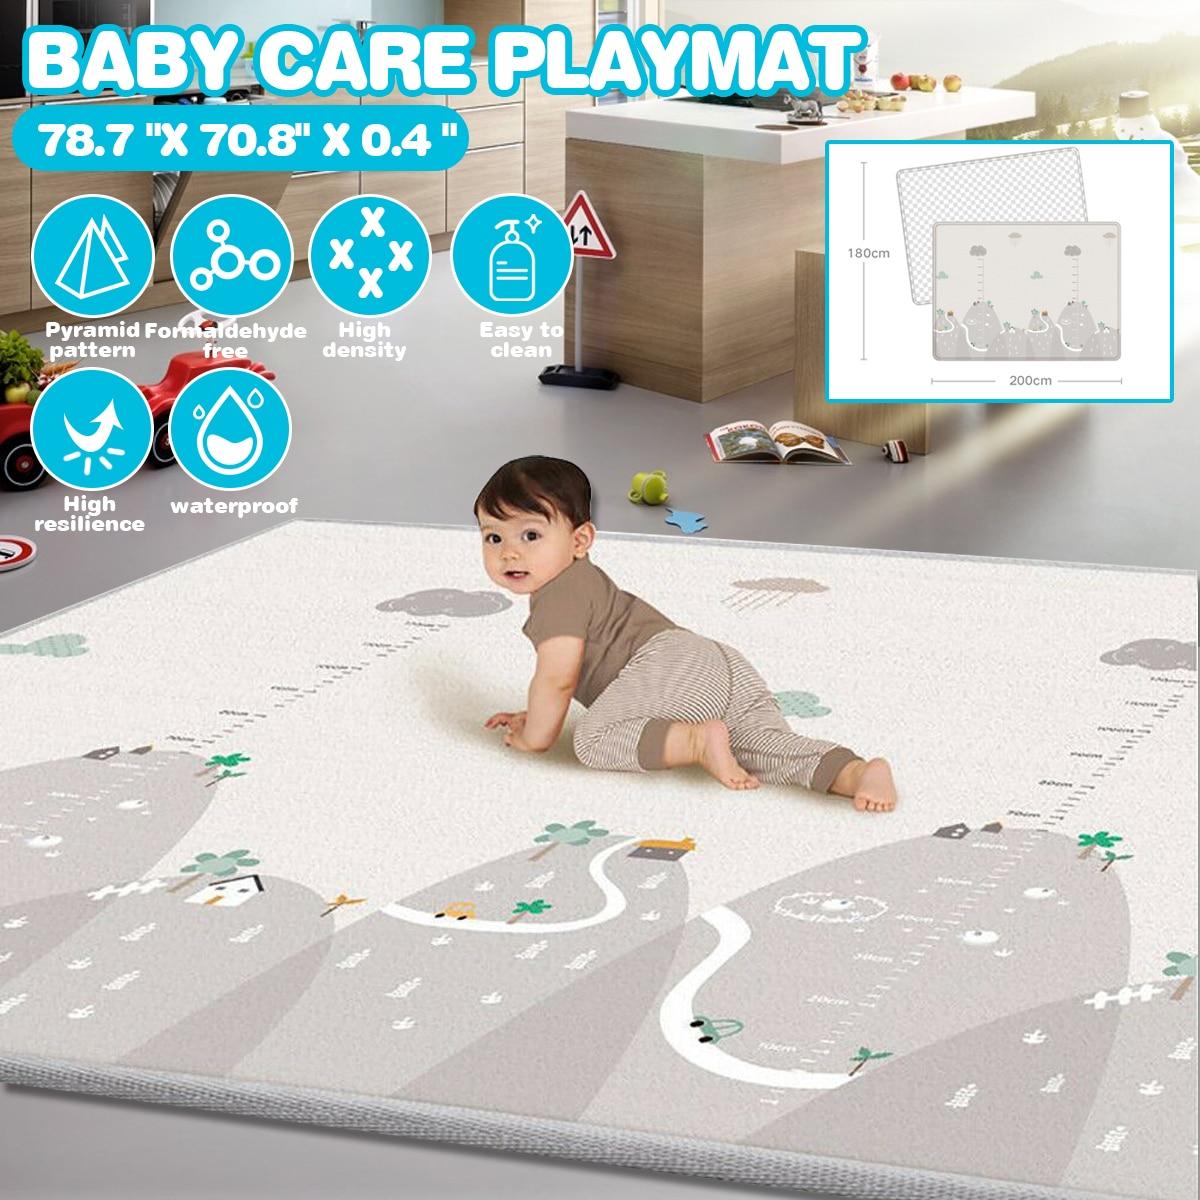 Infant Shining Baby Play-Mat Thickening Eco-friendly Children Playmat EPE 200X180X1.5CM Cartoon Non-slip Carpet Living Room Mat